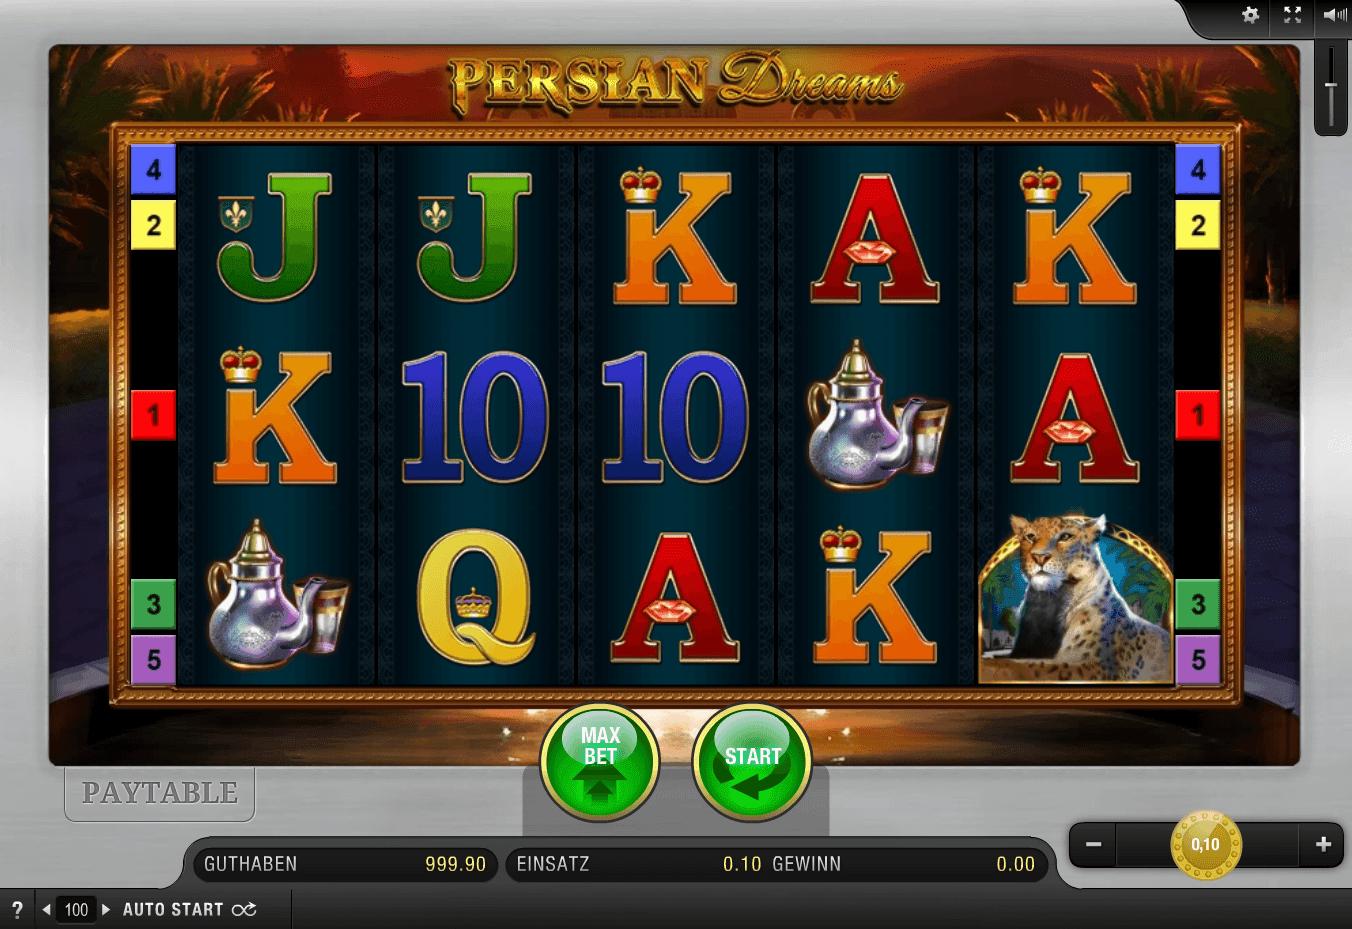 400 casino bonus 10 euro einzahlung